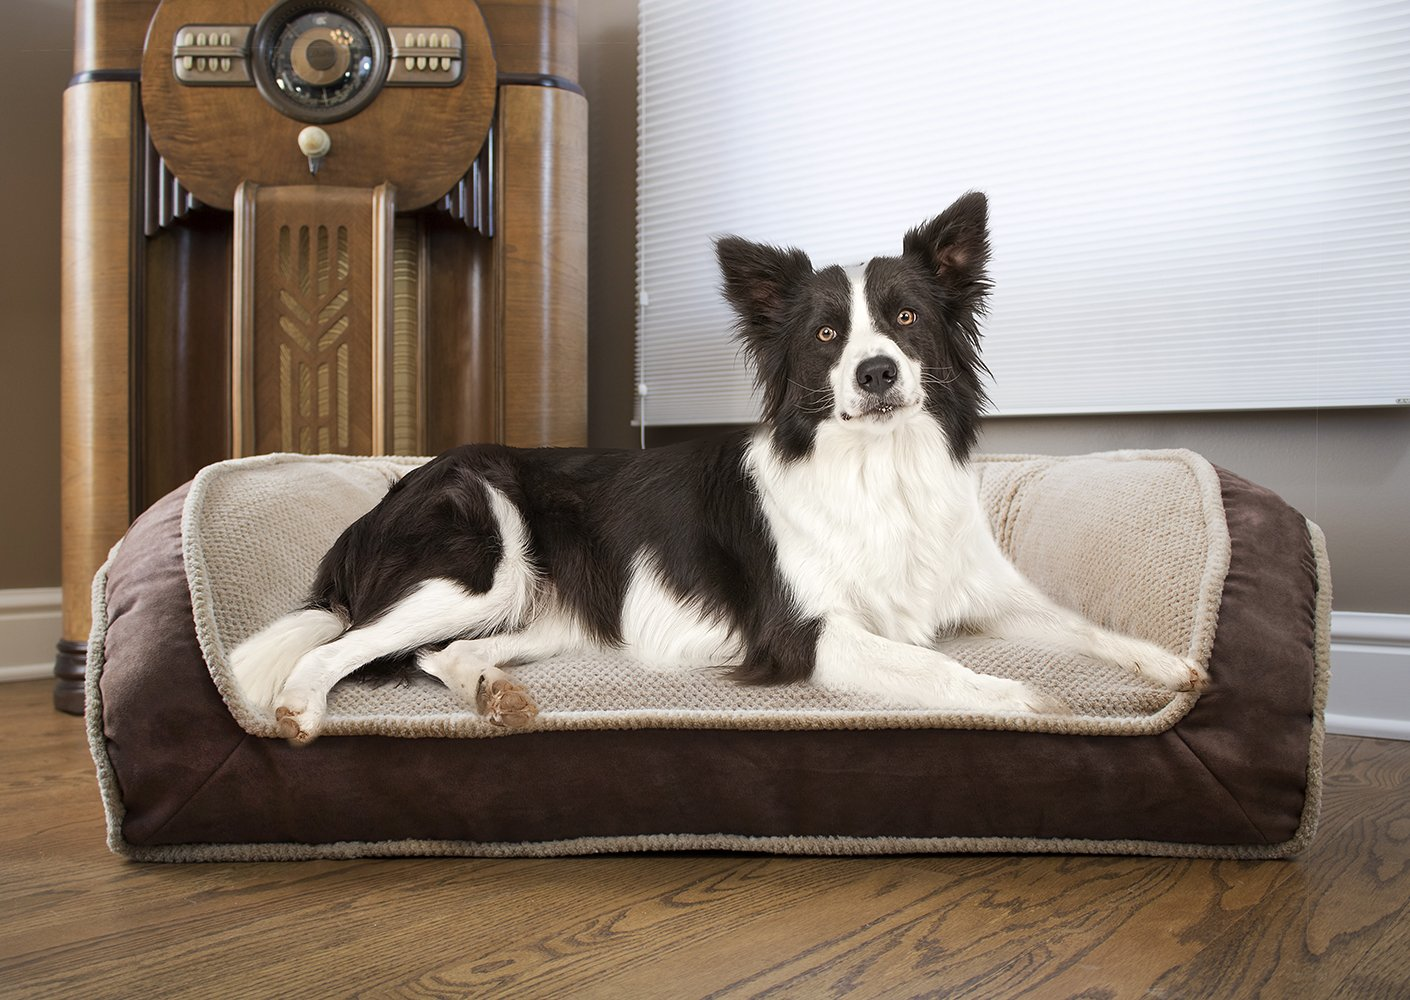 Arlee 59-01000DRF Deep Seated Lounger Sofa Pet Bed, Small/Medium, Driftwood Tan